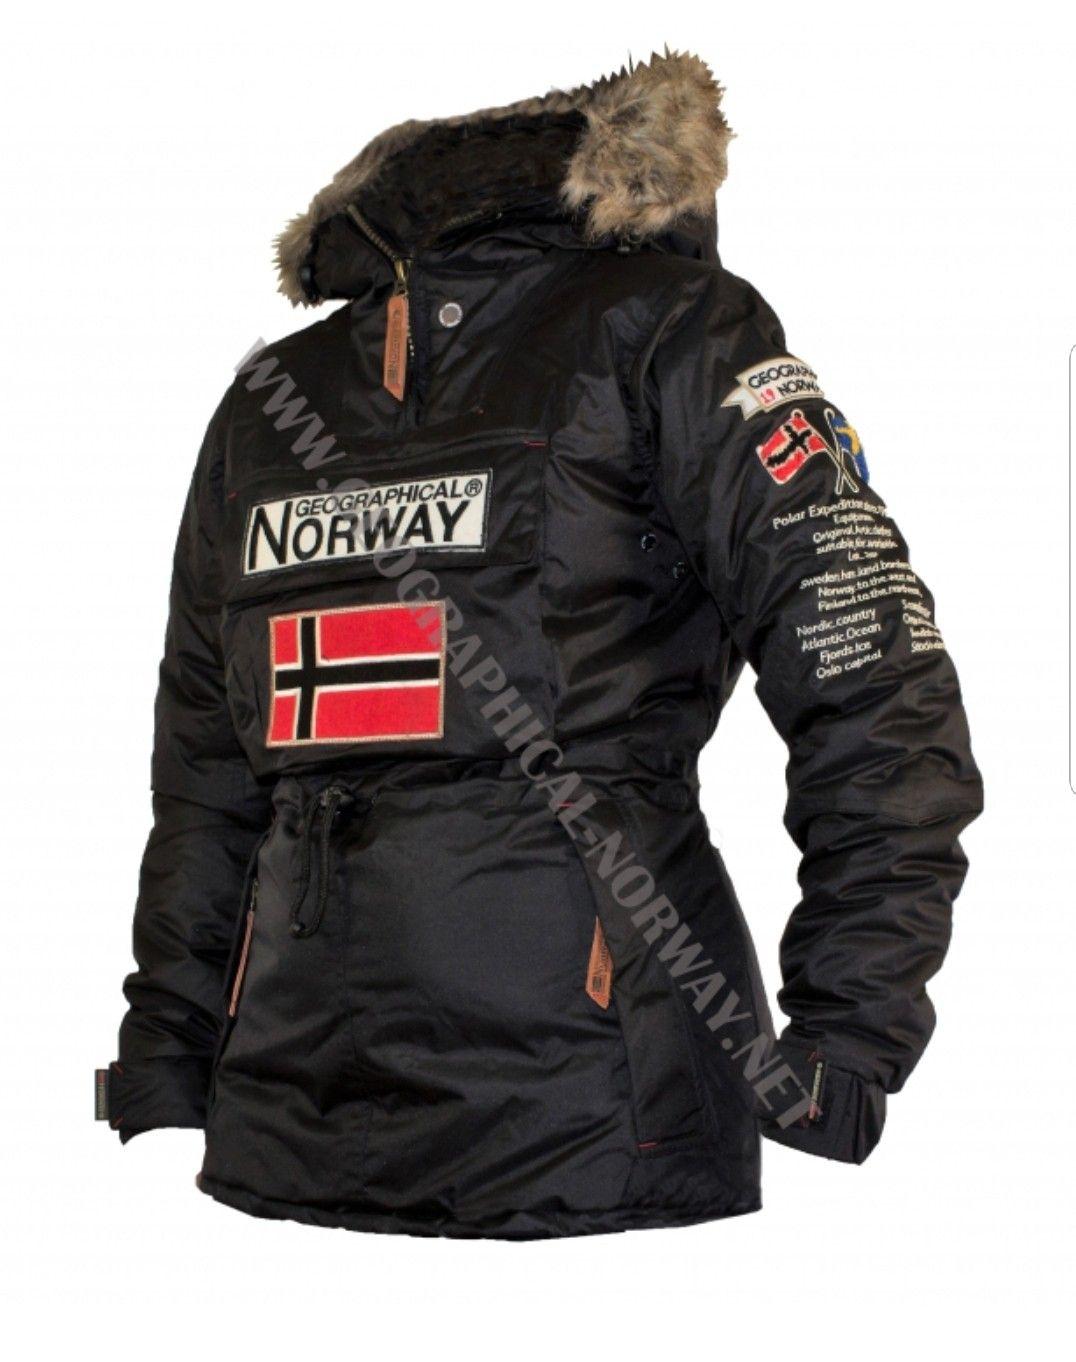 Manteau de ski geographical norway femme